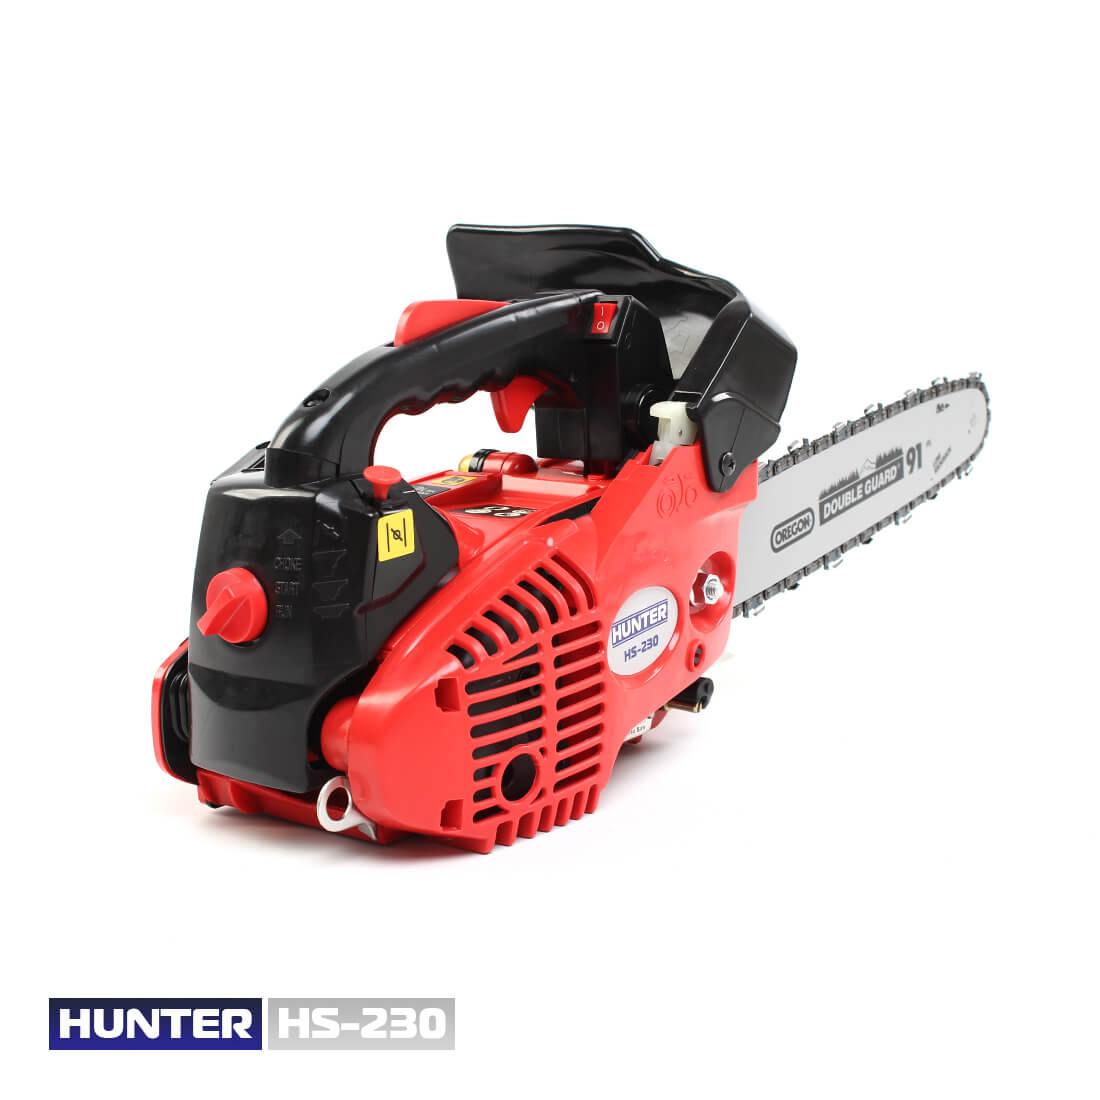 Фото Hunter HS-230 цена 3470грн №5 — Hunter